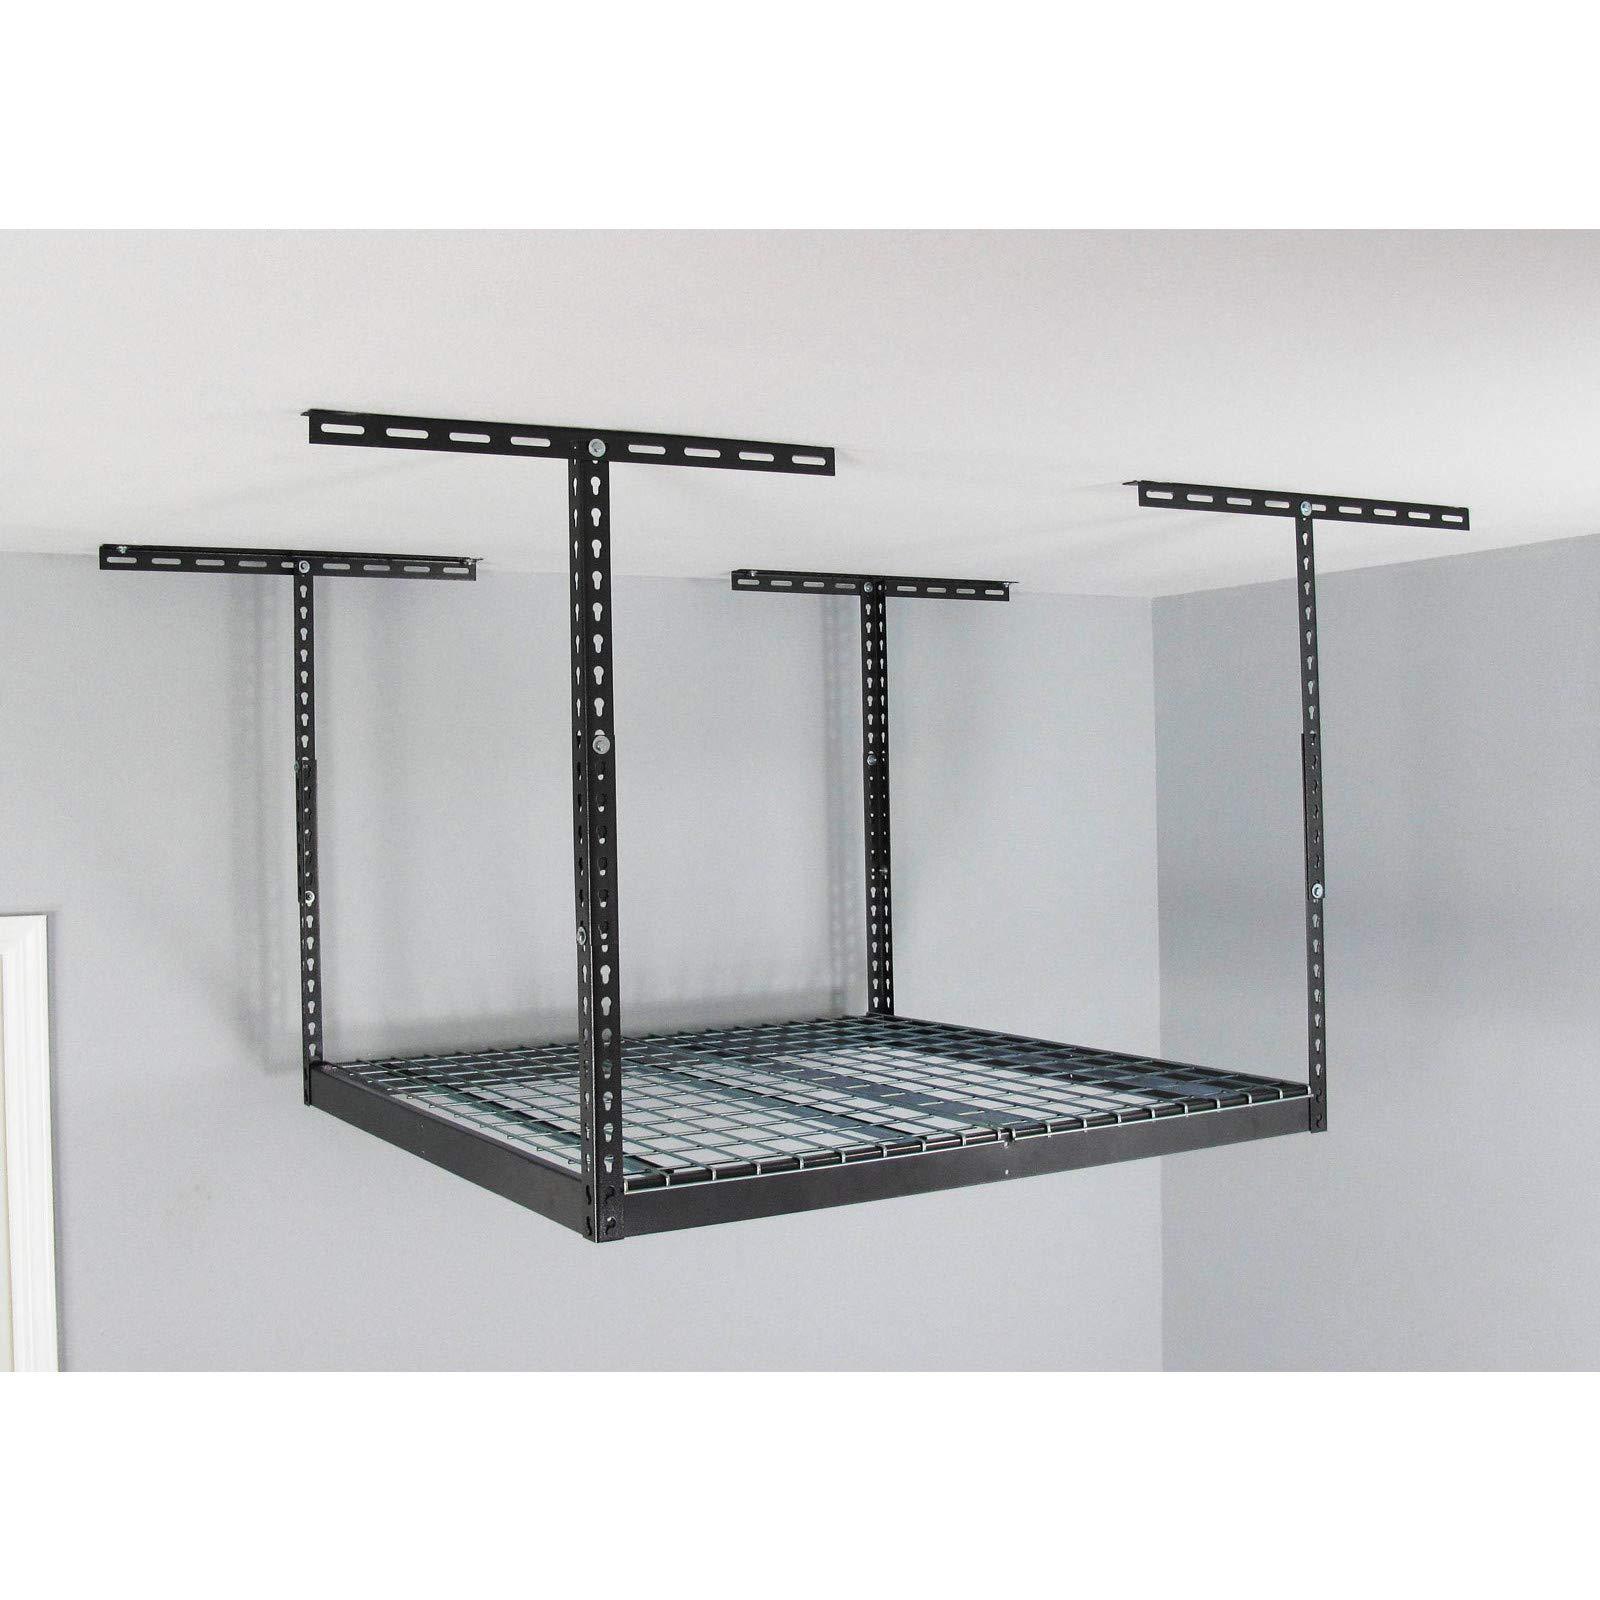 MonsterRax - 4x4 Overhead Garage Storage Rack (12''-21'')